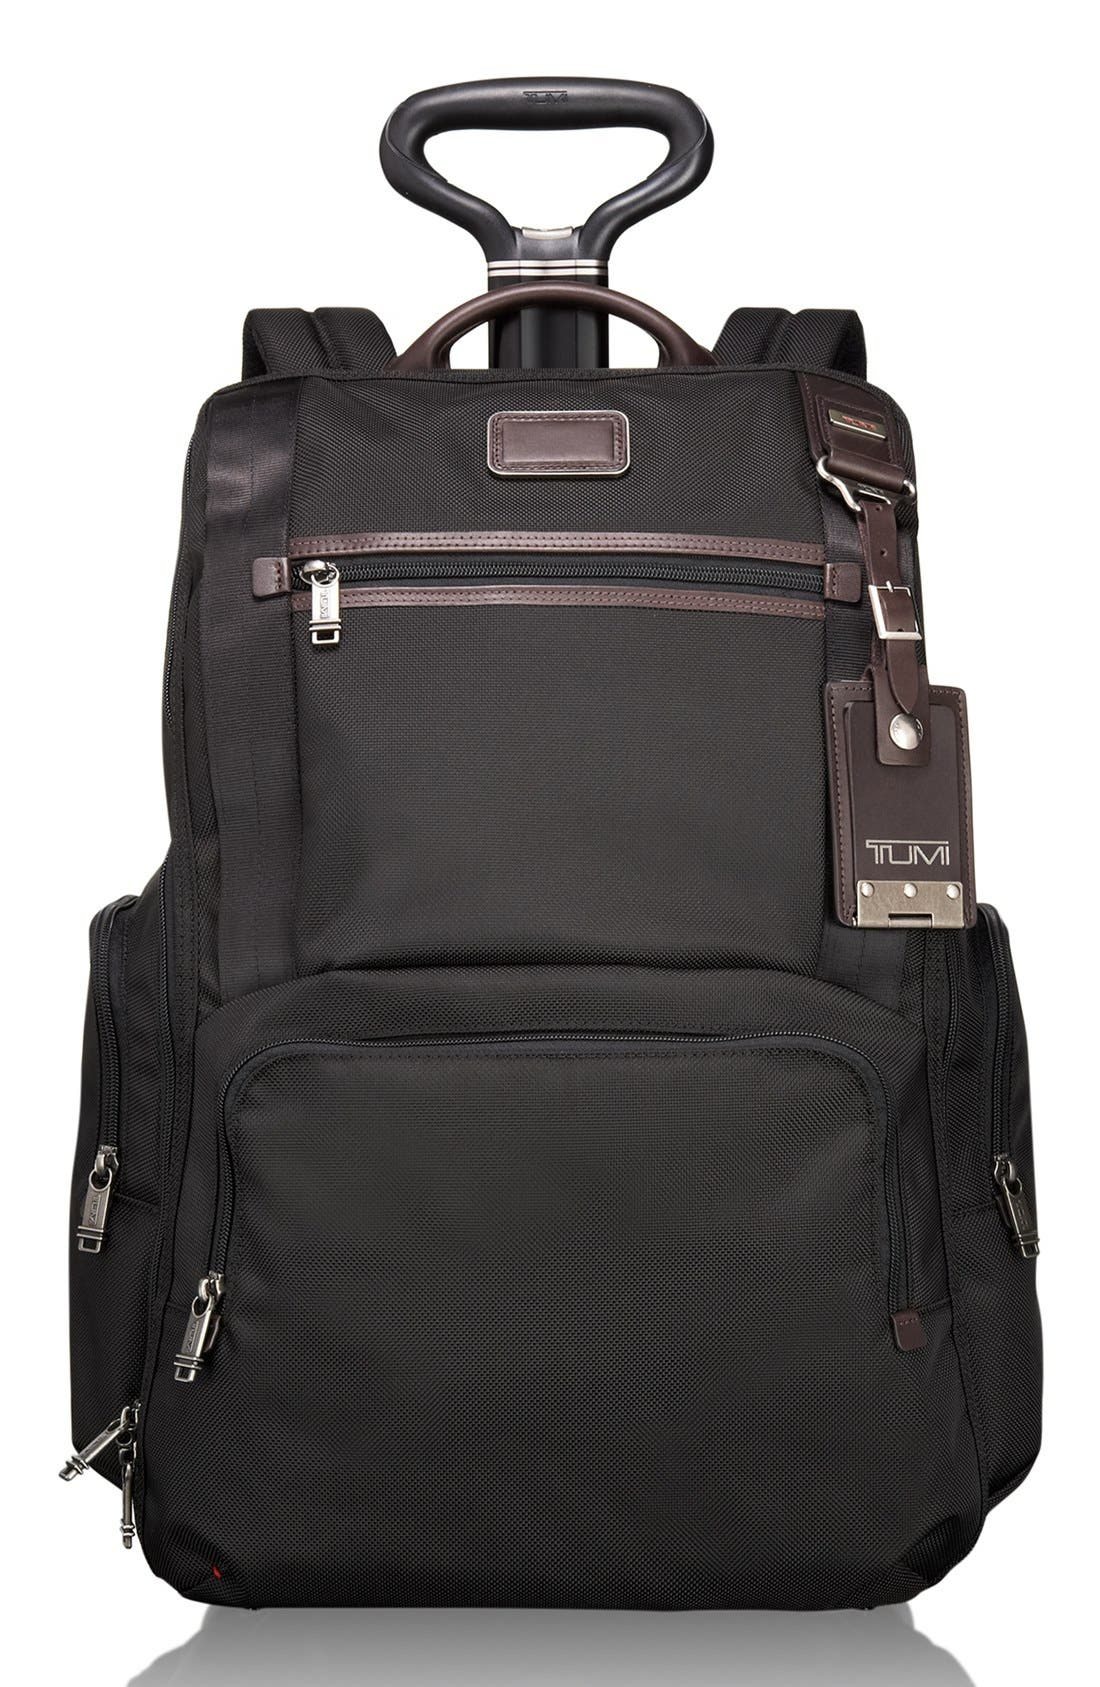 Main Image - Tumi 'Alpha Bravo - Lemoore' Wheeled Backpack (21 Inch)